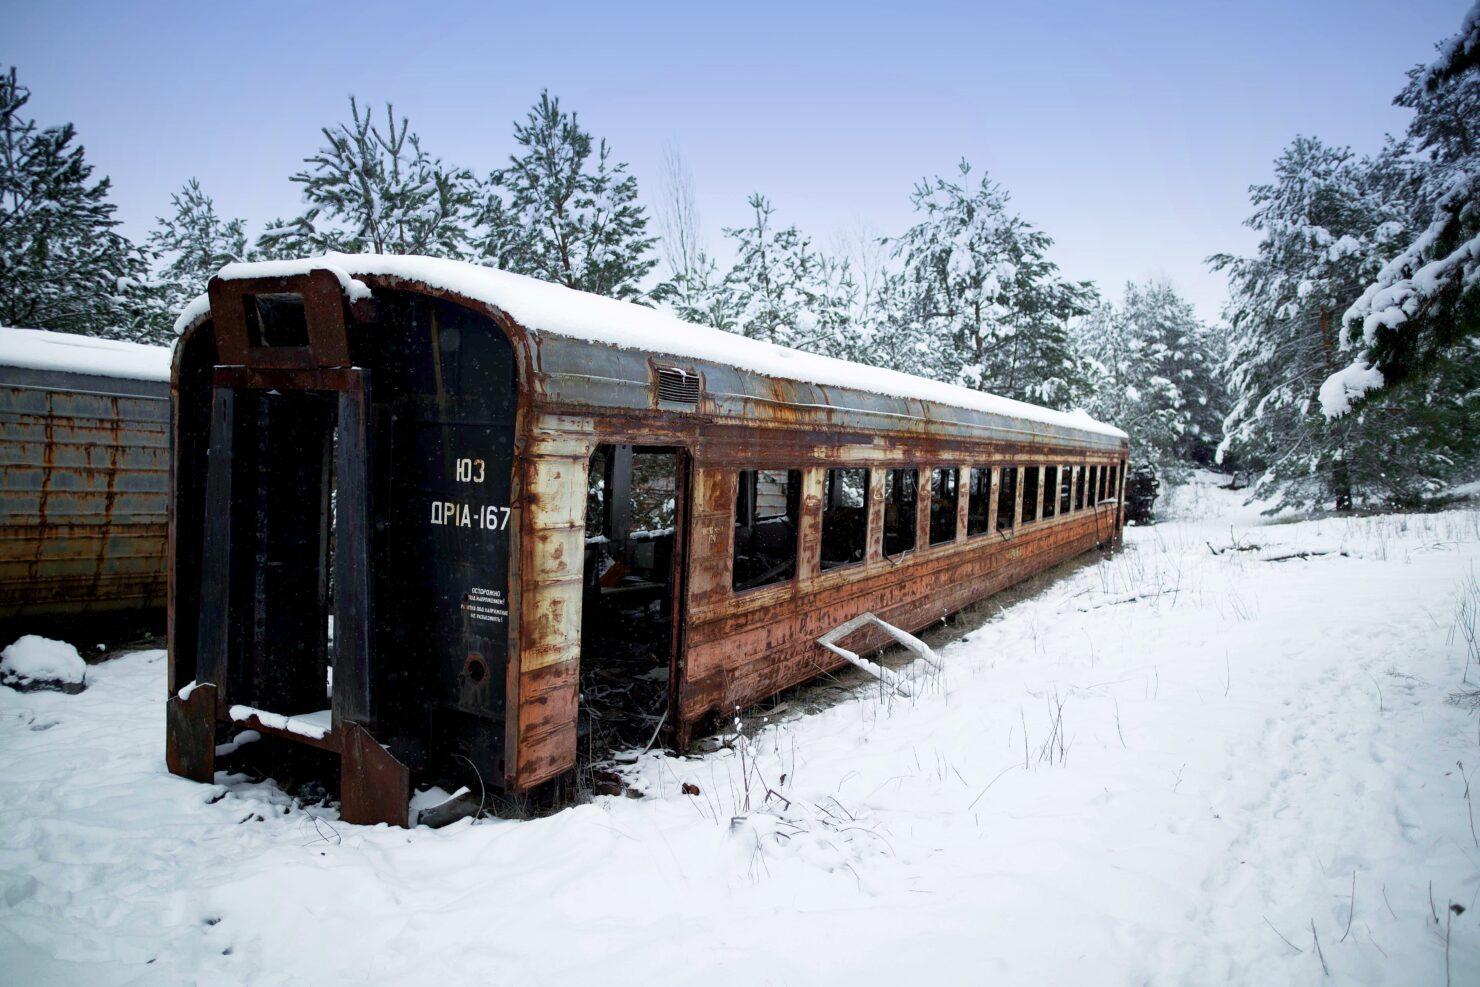 metro-exodus-brought-to-life-02-comparison-train-chernobyl